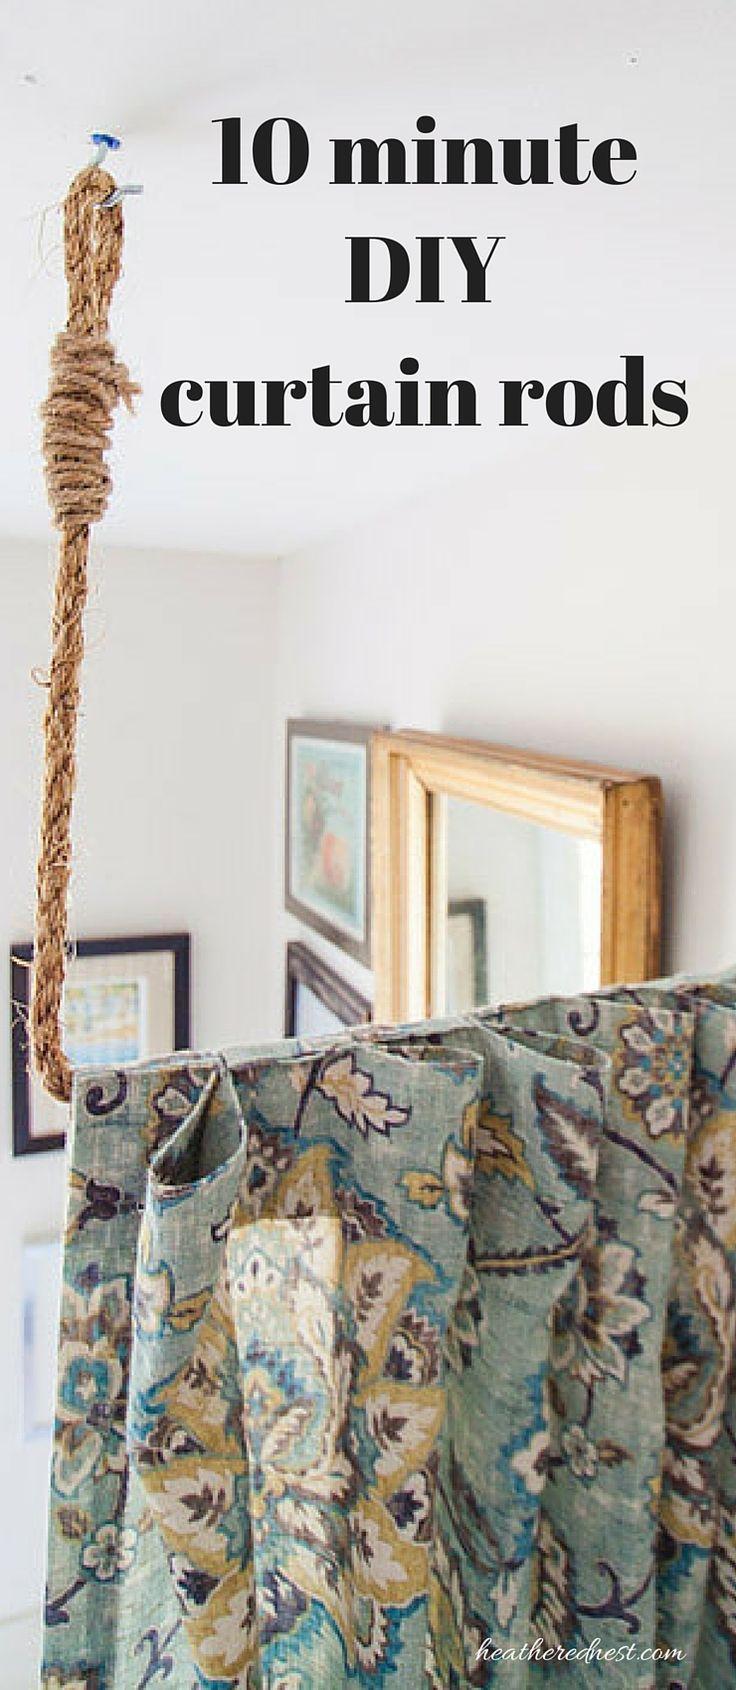 Pipe Dreams. AKA Build a DIY Curtain Rod in 10 minutes